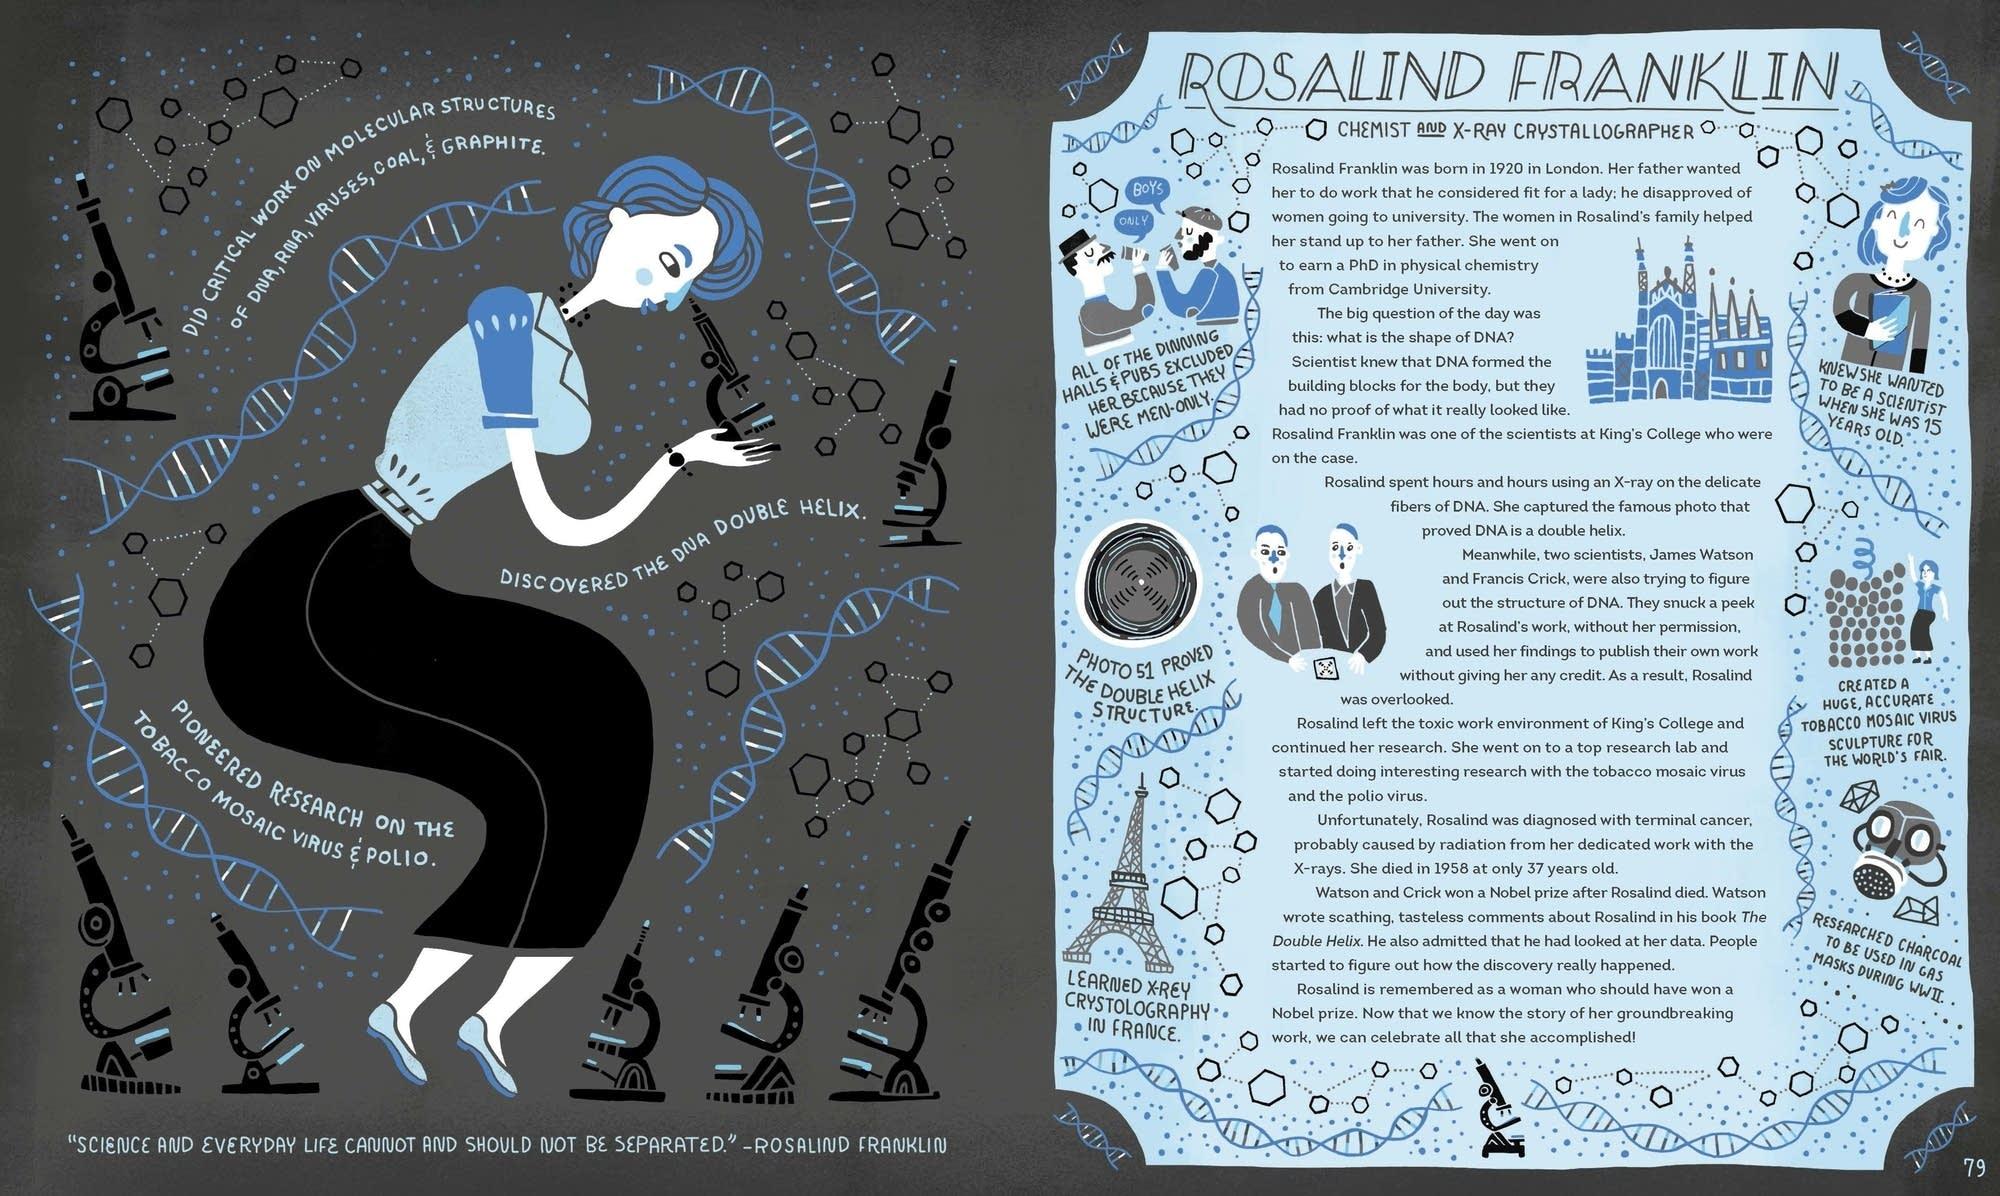 Rosalind Franklin, a chemist